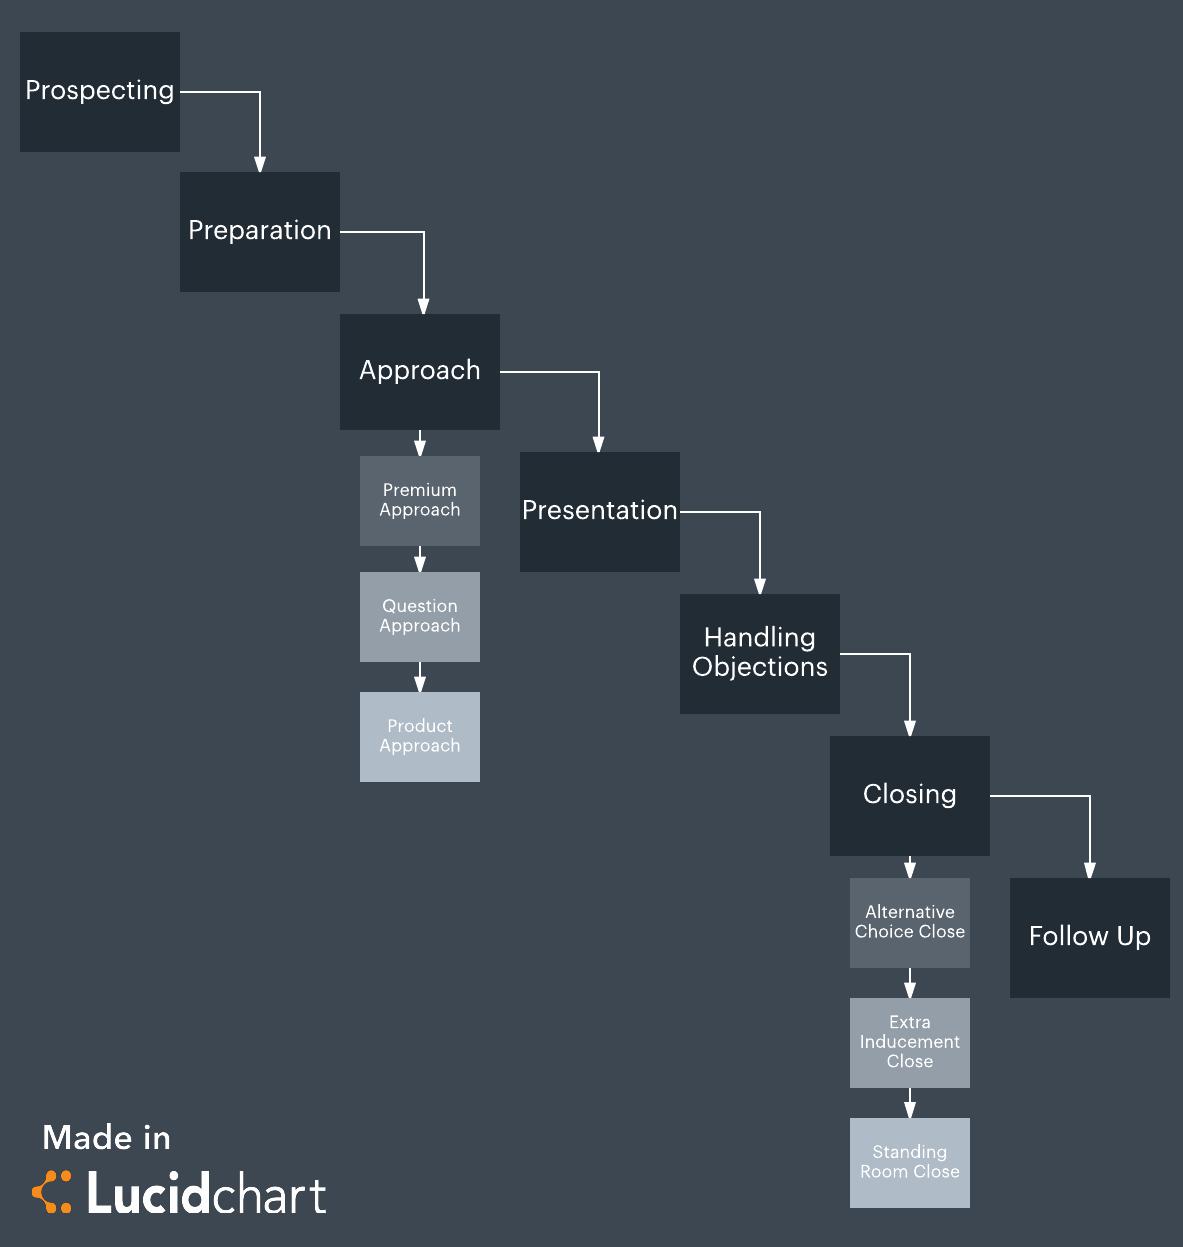 Phenomenal Process Flow Diagram Best Practices Wiring Library Wiring Cloud Pendufoxcilixyz